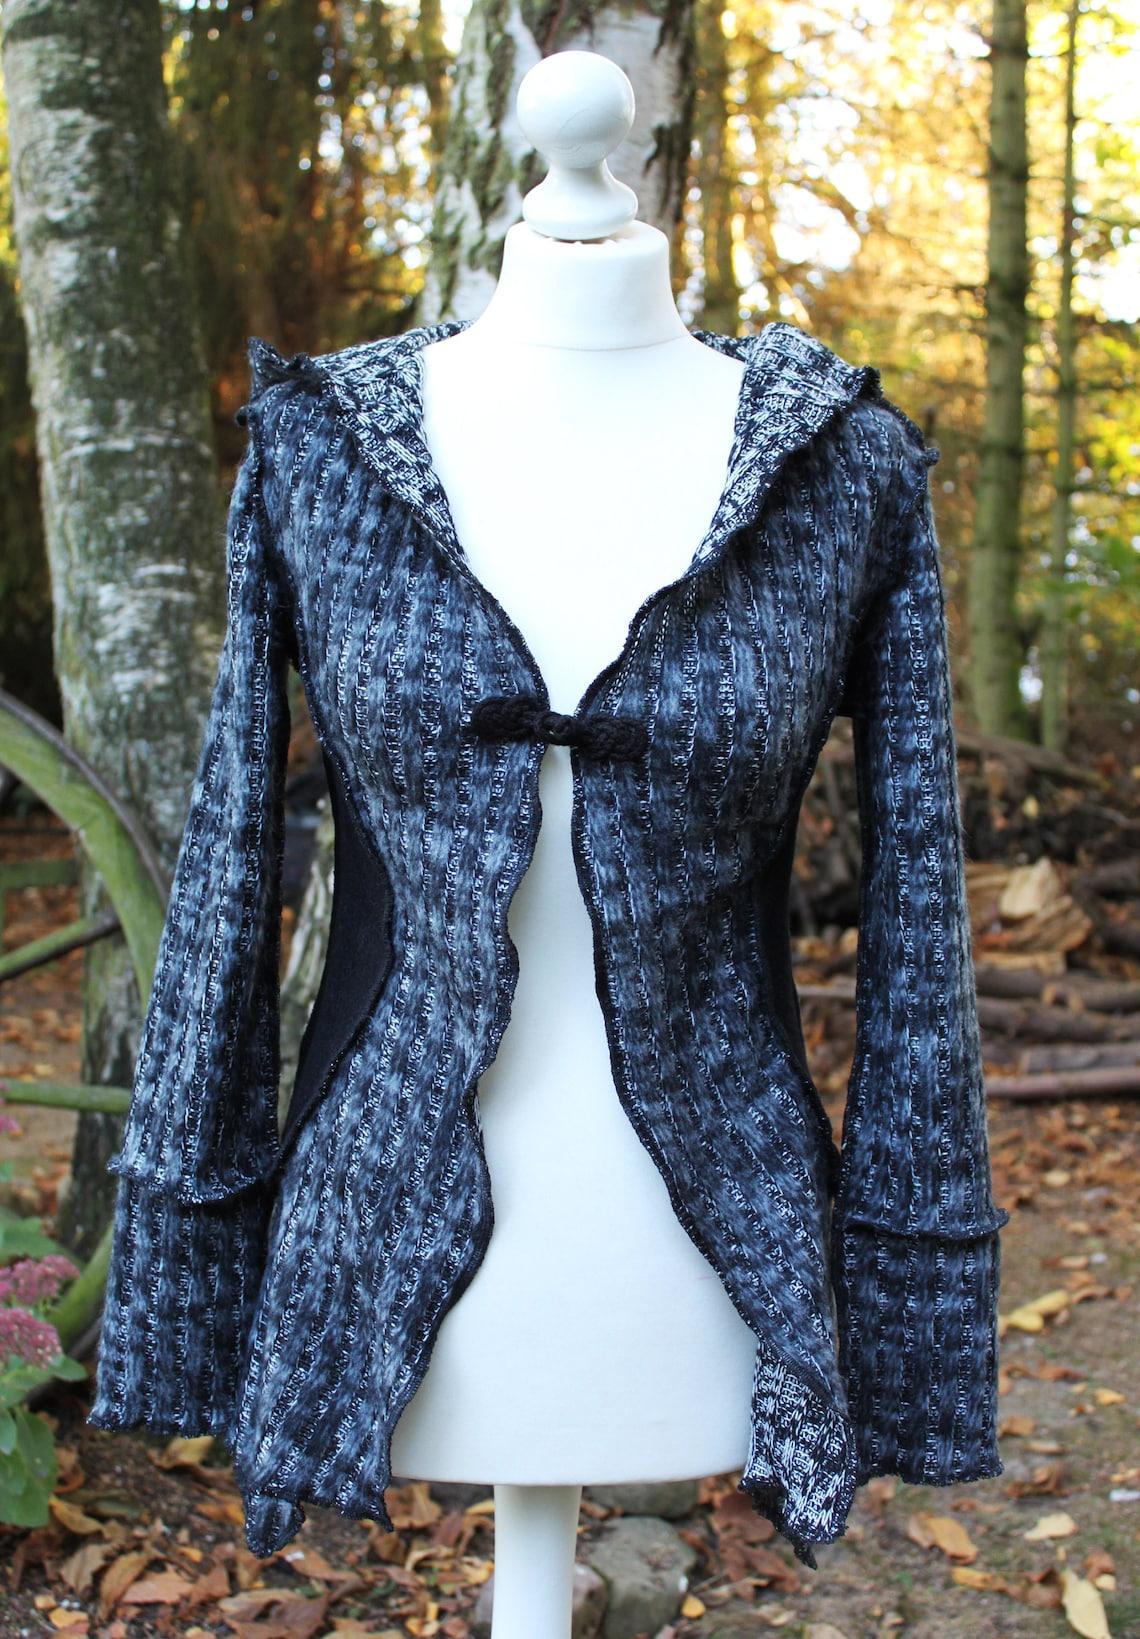 Zip Jacket Nona 05, Jacket, Wool Blazer, Blazer Black Grey Cardigan, Handmade